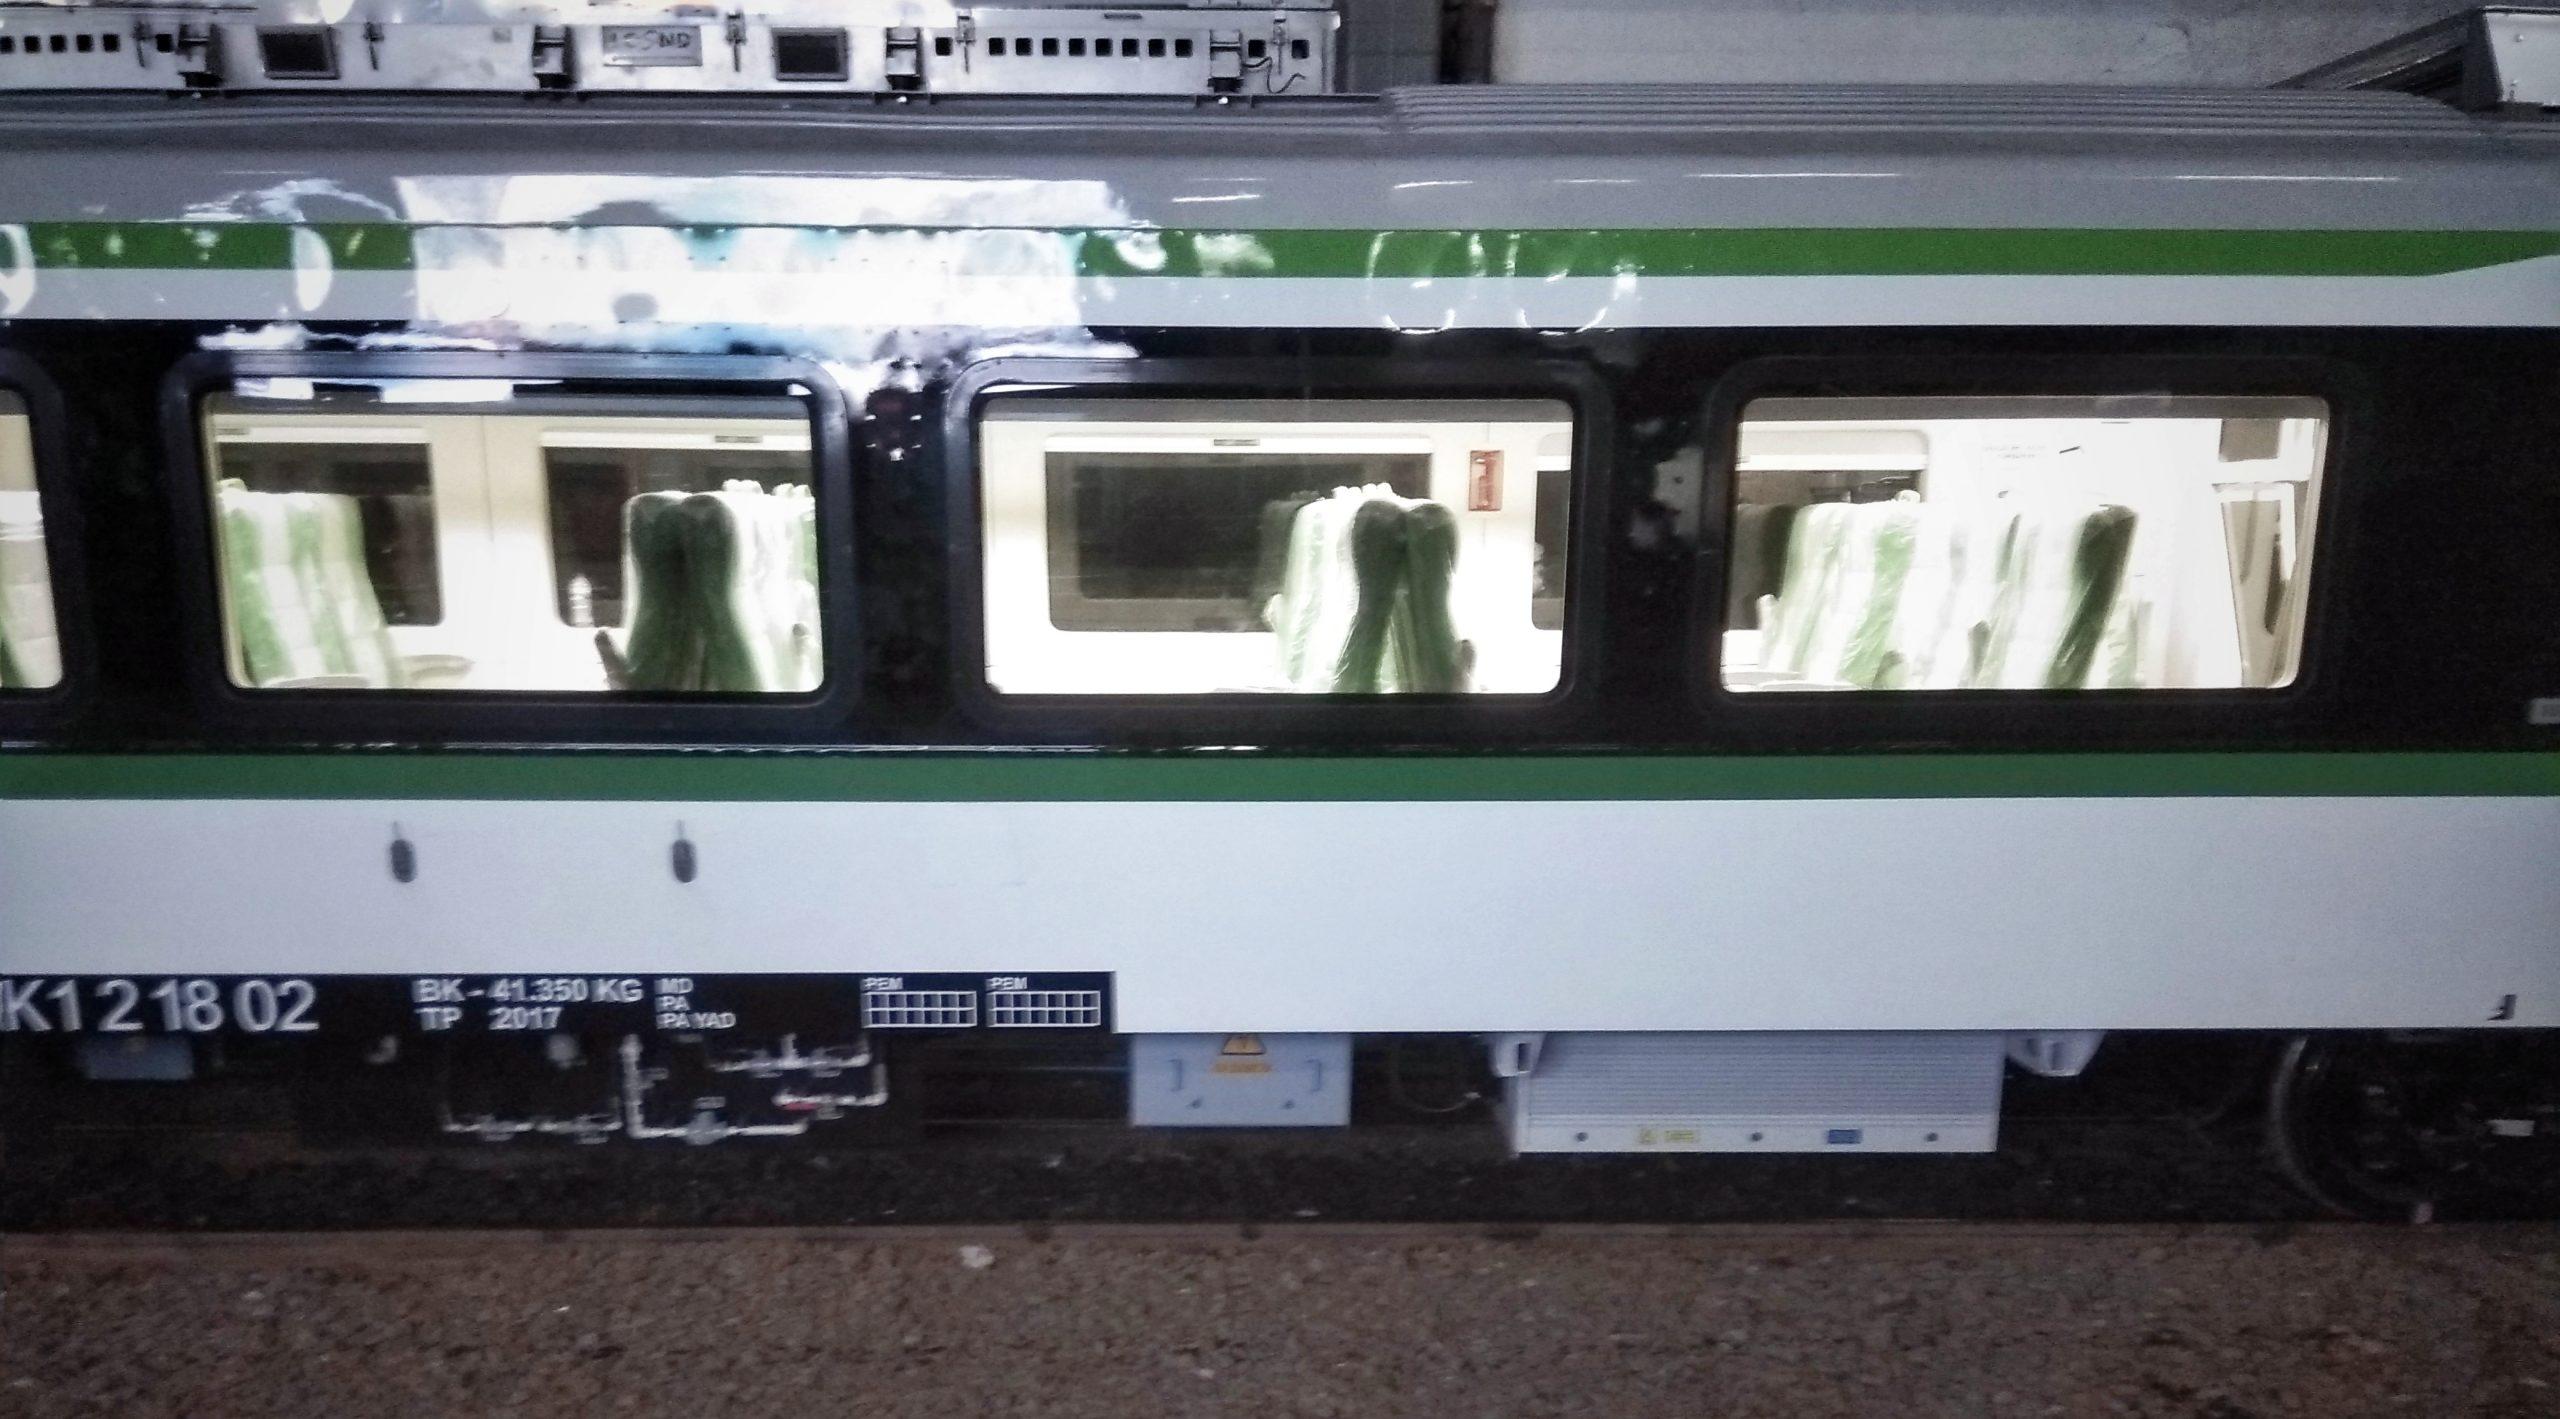 Sistem Elektrikal MITRAC 1000 pada KRDE ME 204